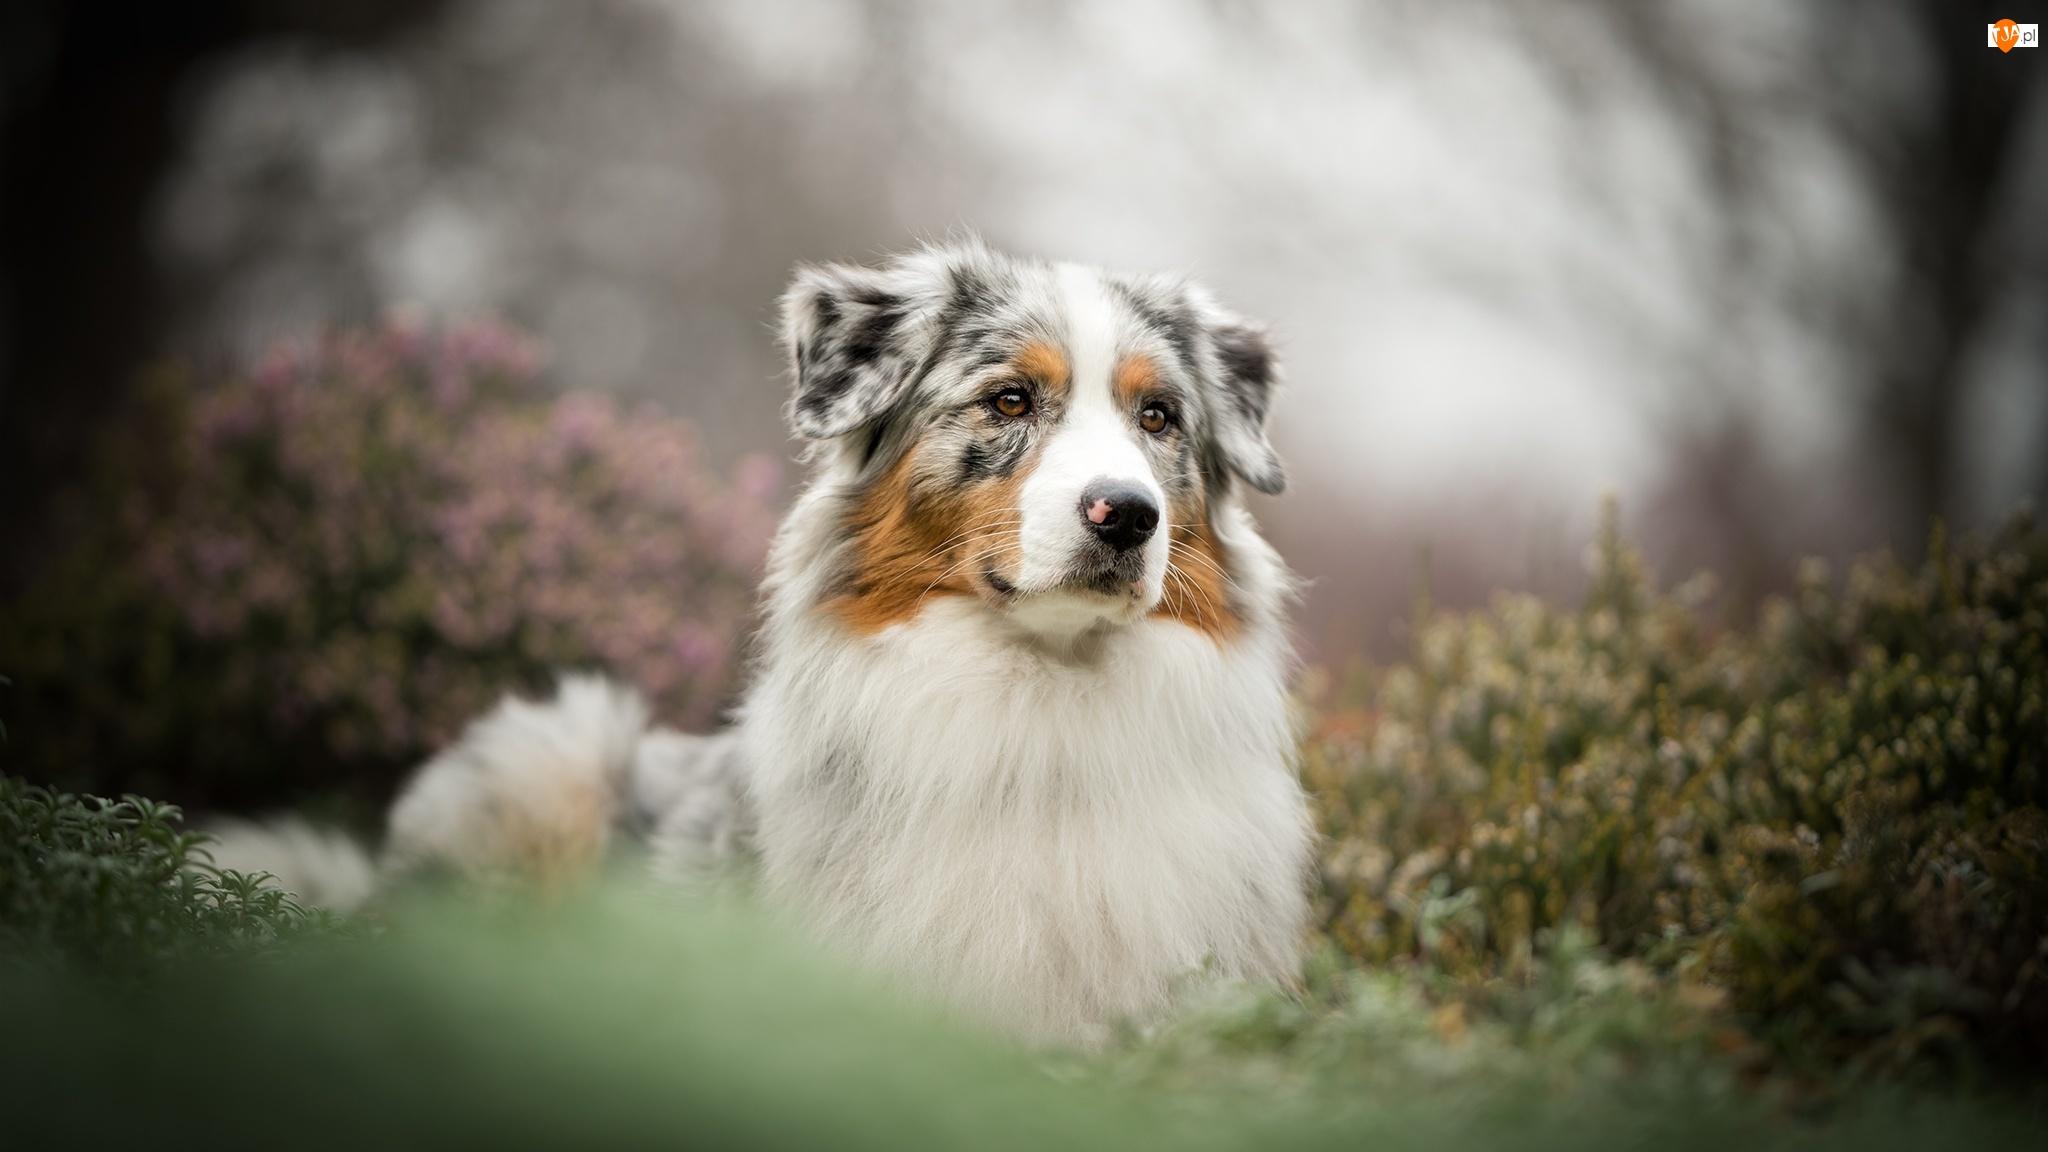 Mordka, Bokeh, Owczarek australijski, Pies, Rośliny